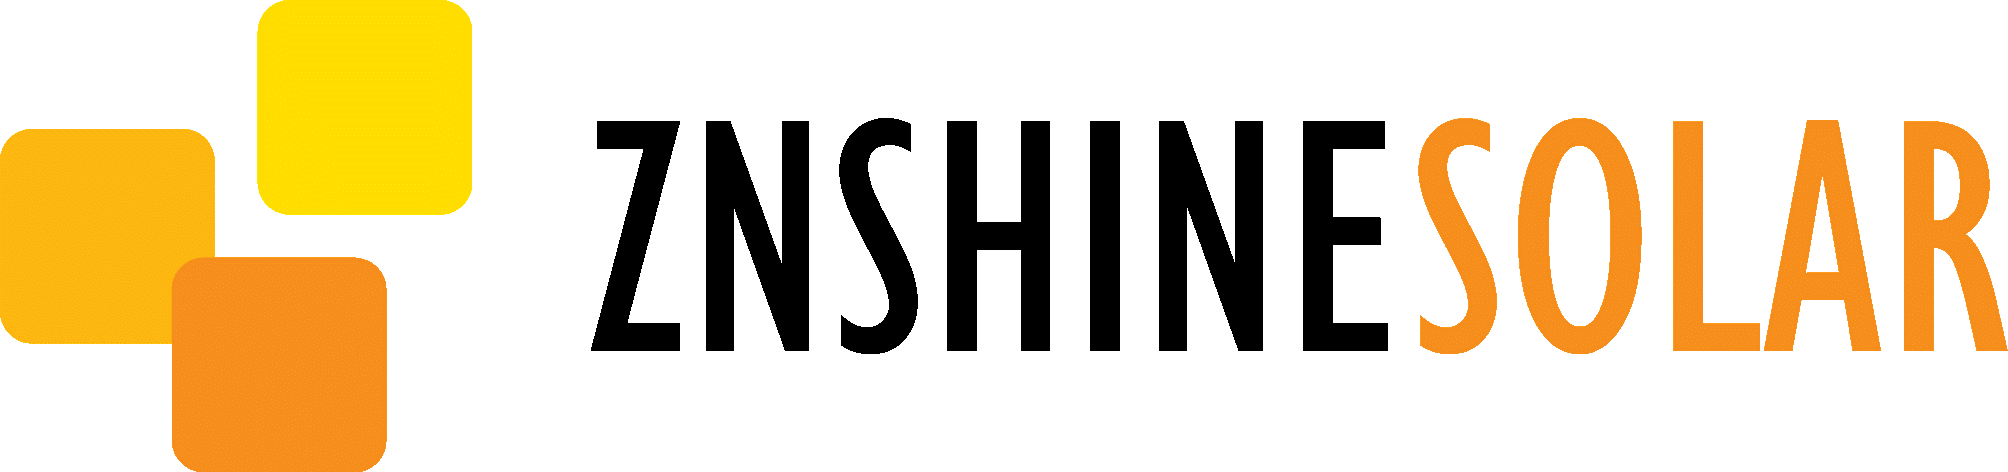 znshinesolar-distribuidores-colombia